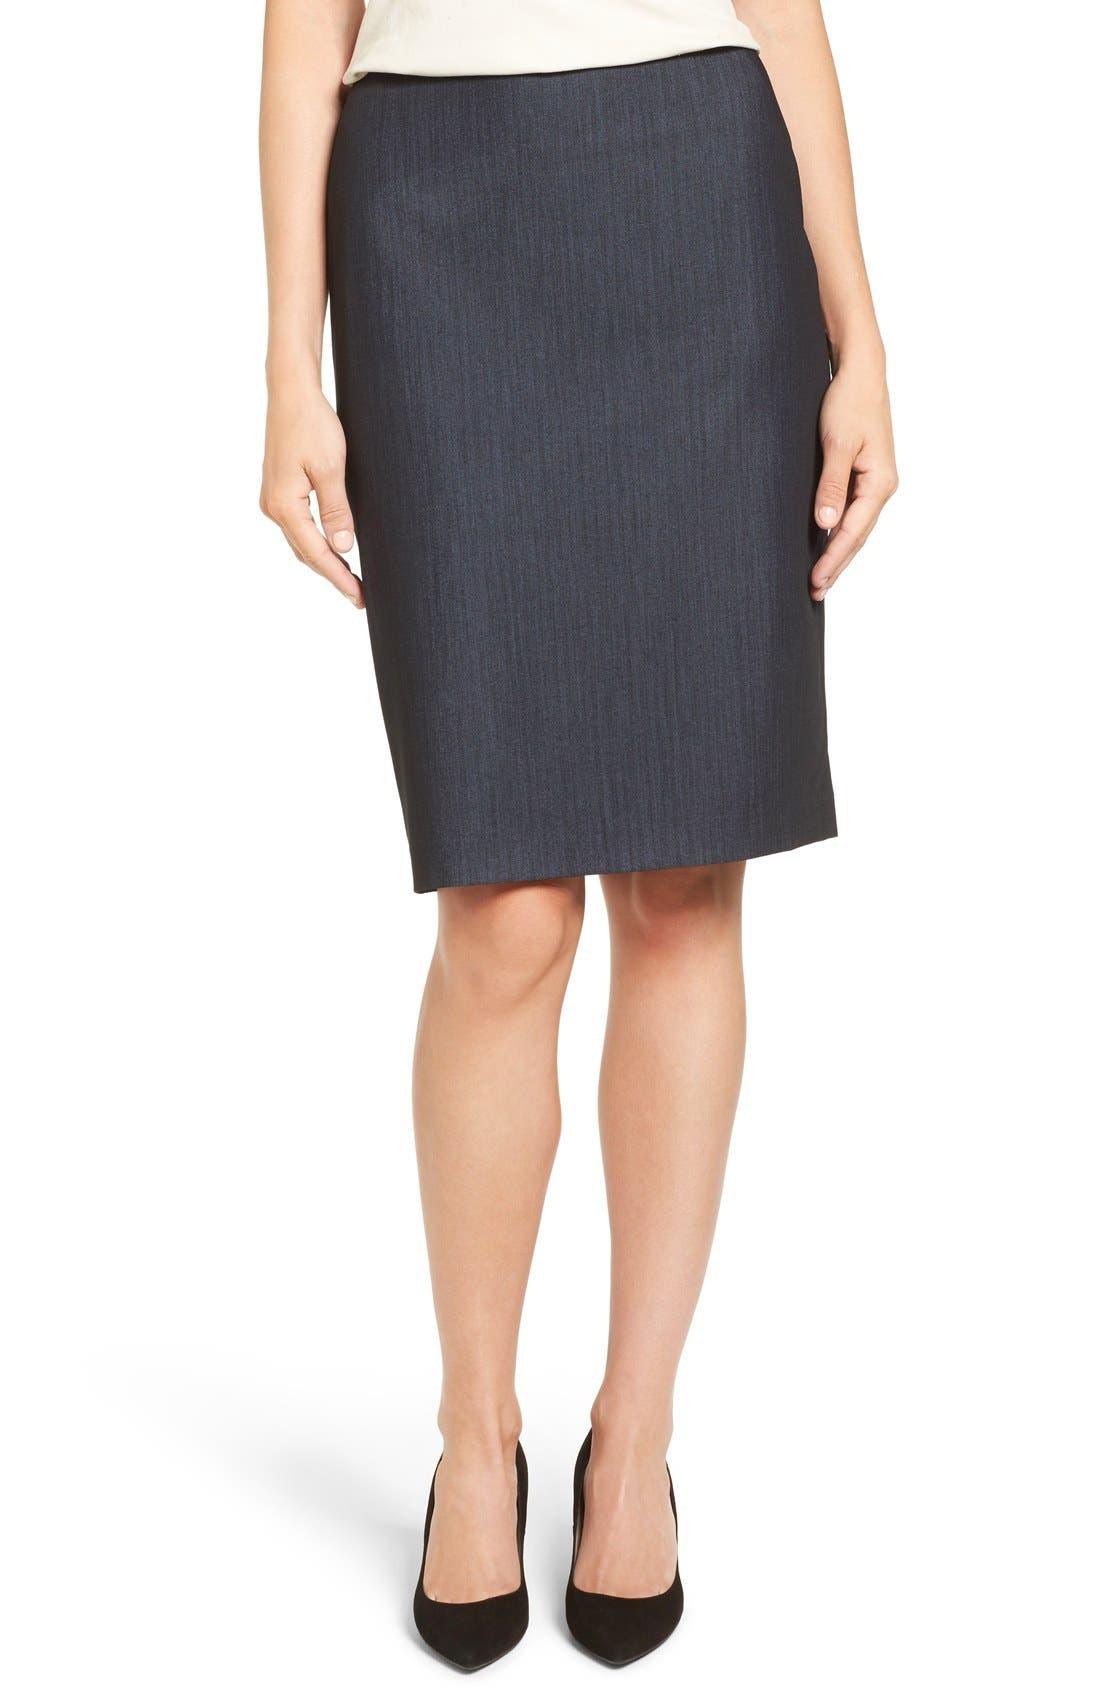 ANNE KLEIN Stretch Woven Suit Skirt, Main, color, INDIGO TWILL